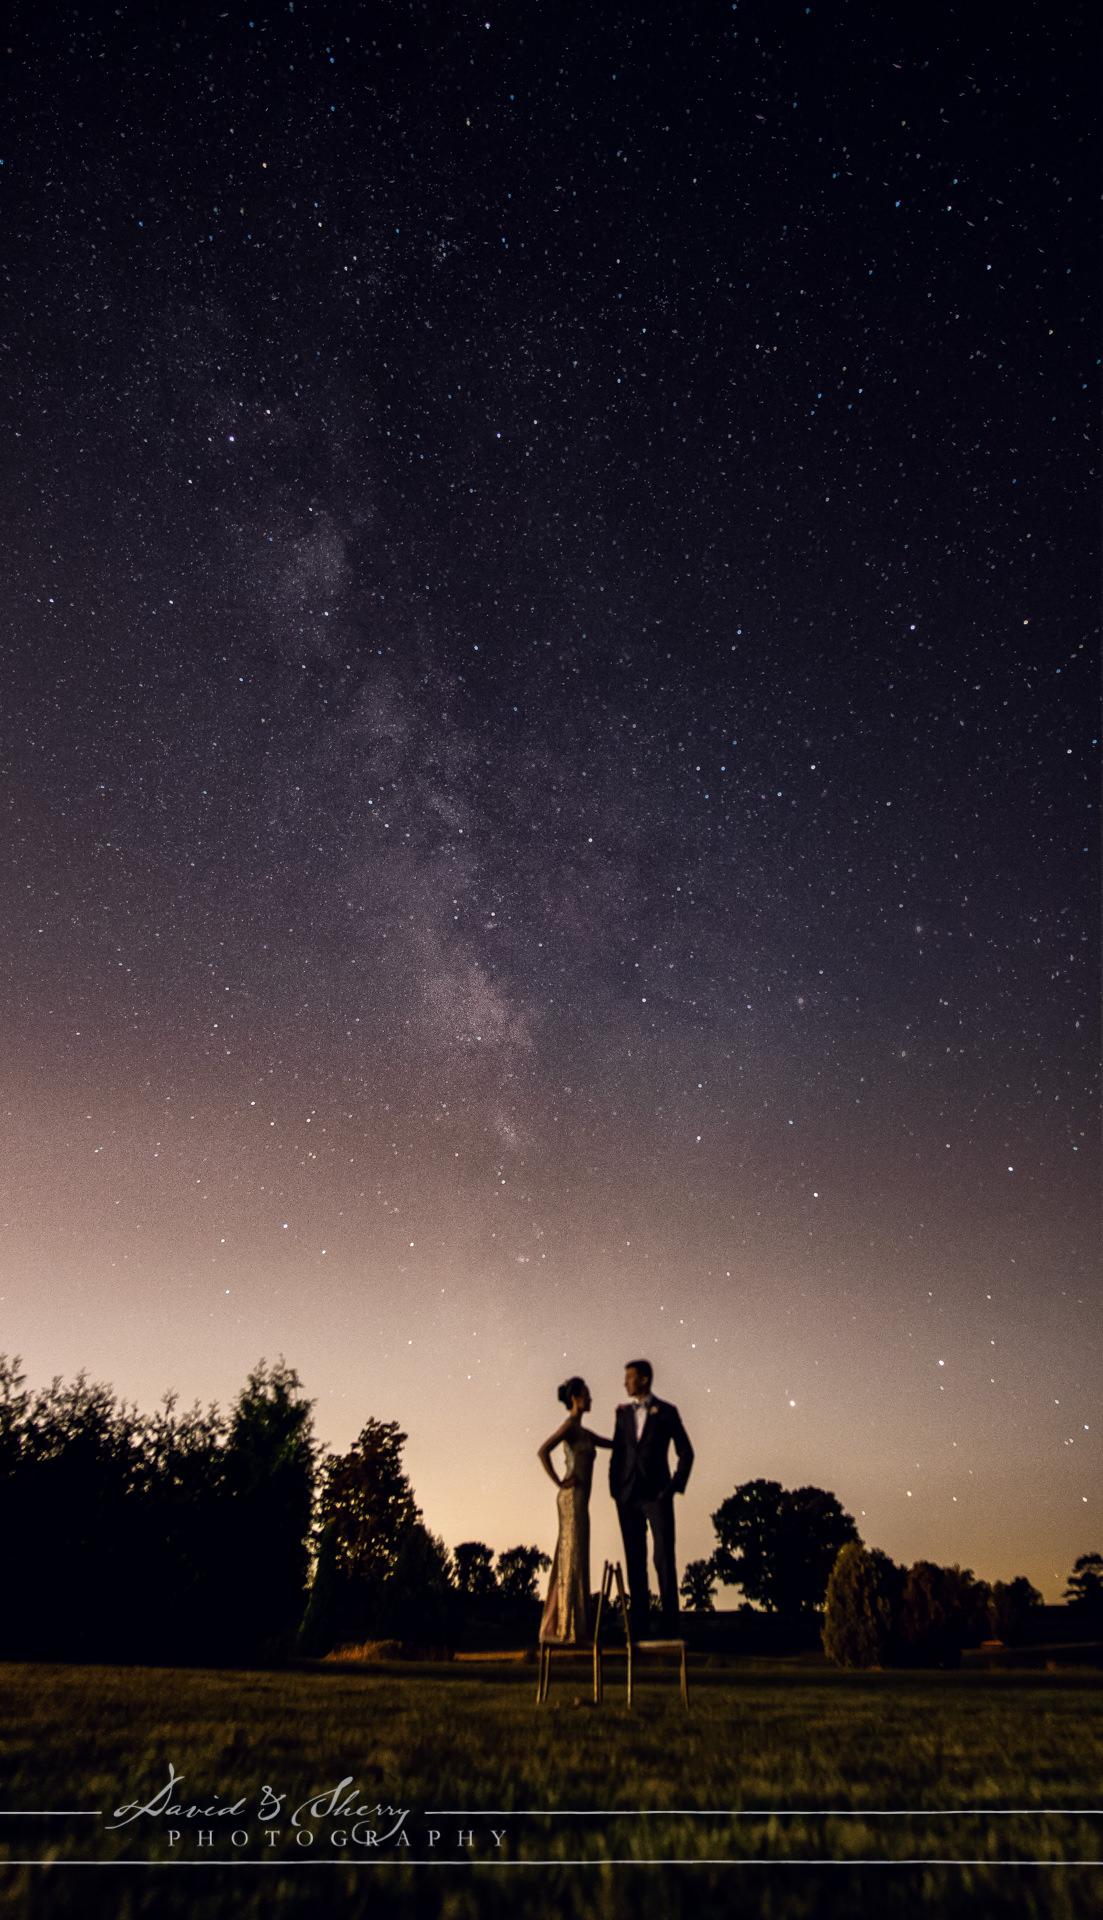 waterstone-estate-wedding-david-sherry-photography-simon-crystal-030